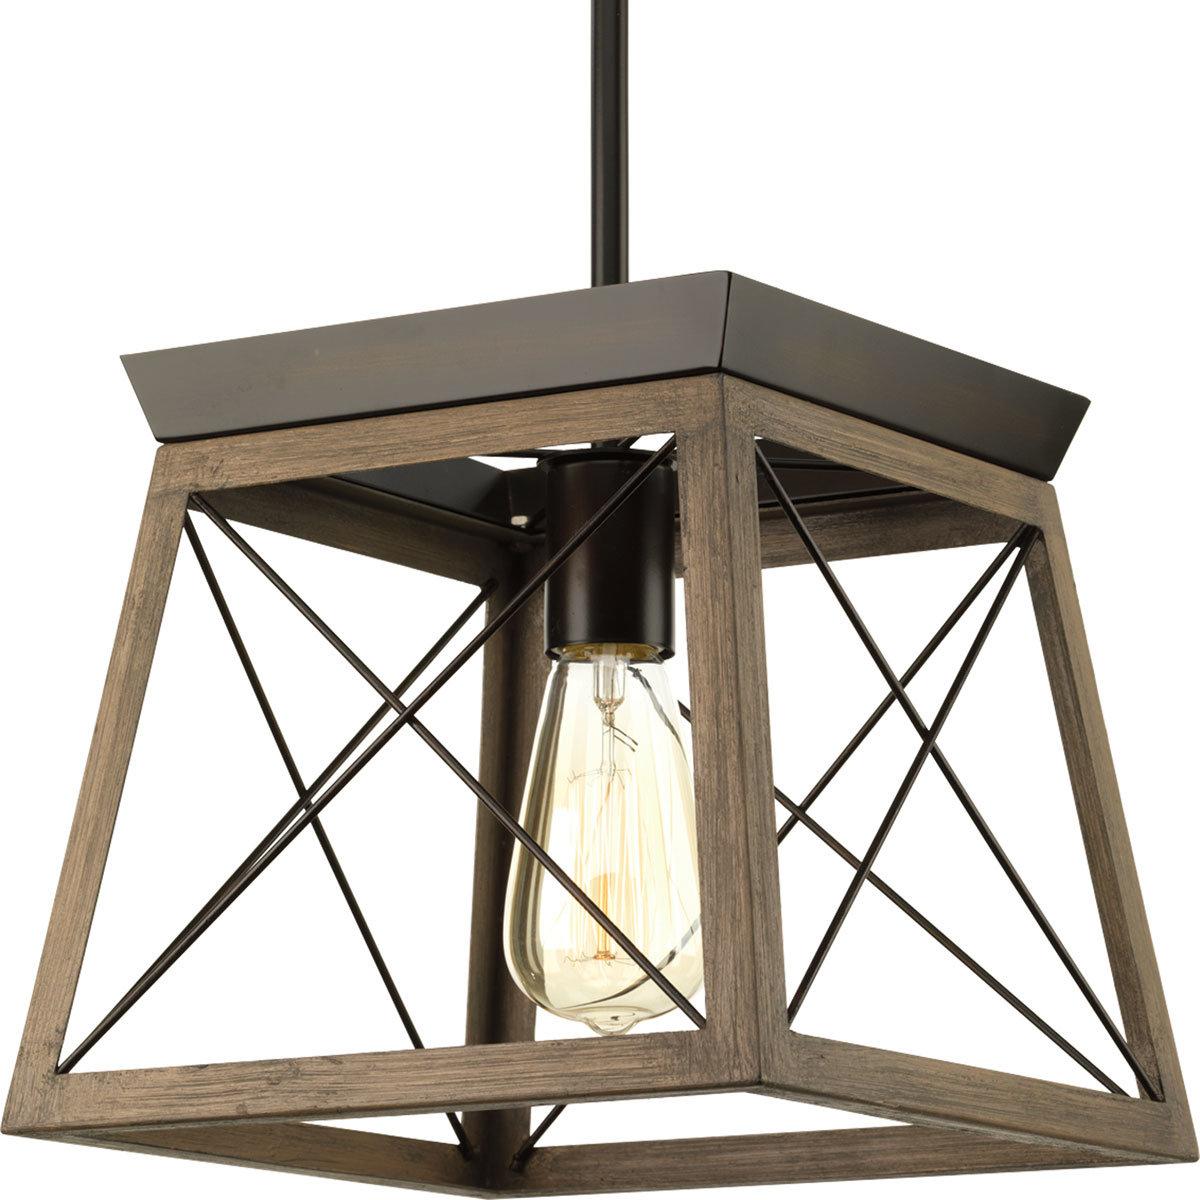 Delon 1 Light Lantern Geometric Pendant With Regard To Fashionable Delon 1 Light Lantern Geometric Pendants (View 4 of 25)